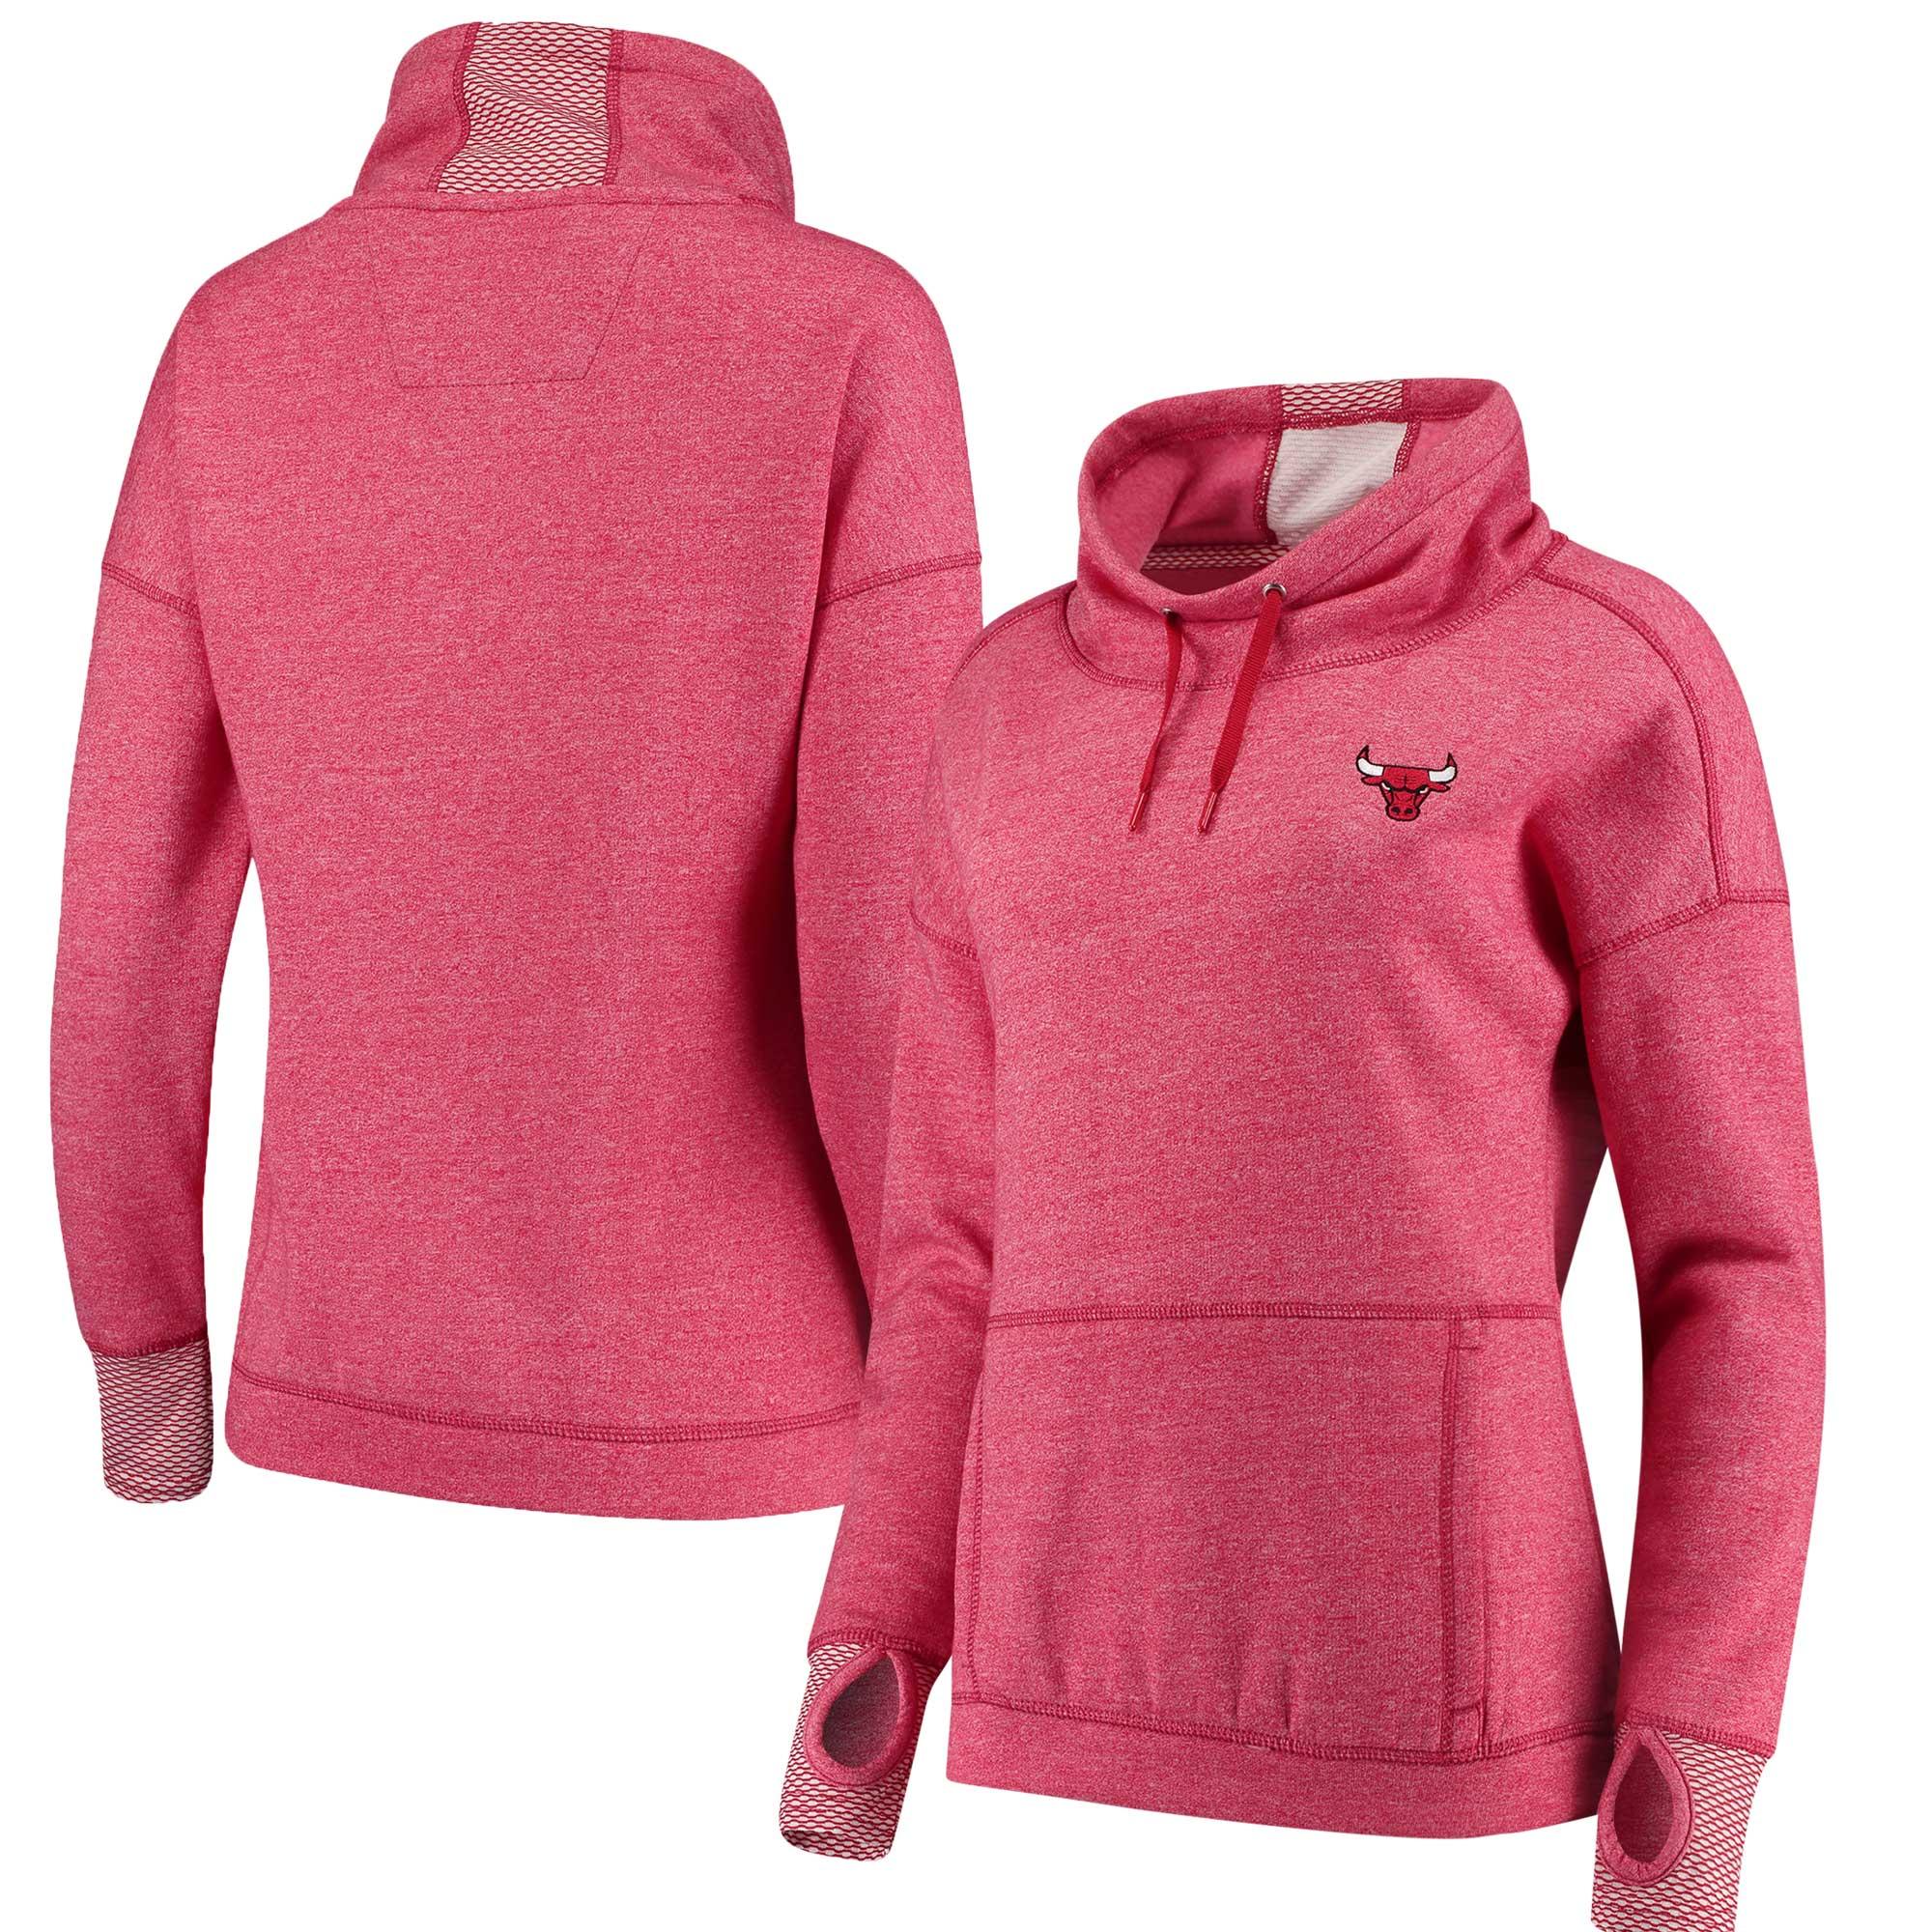 Chicago Bulls Antigua Women's Snap Cowl Neck Pullover Sweatshirt - Heathered Red